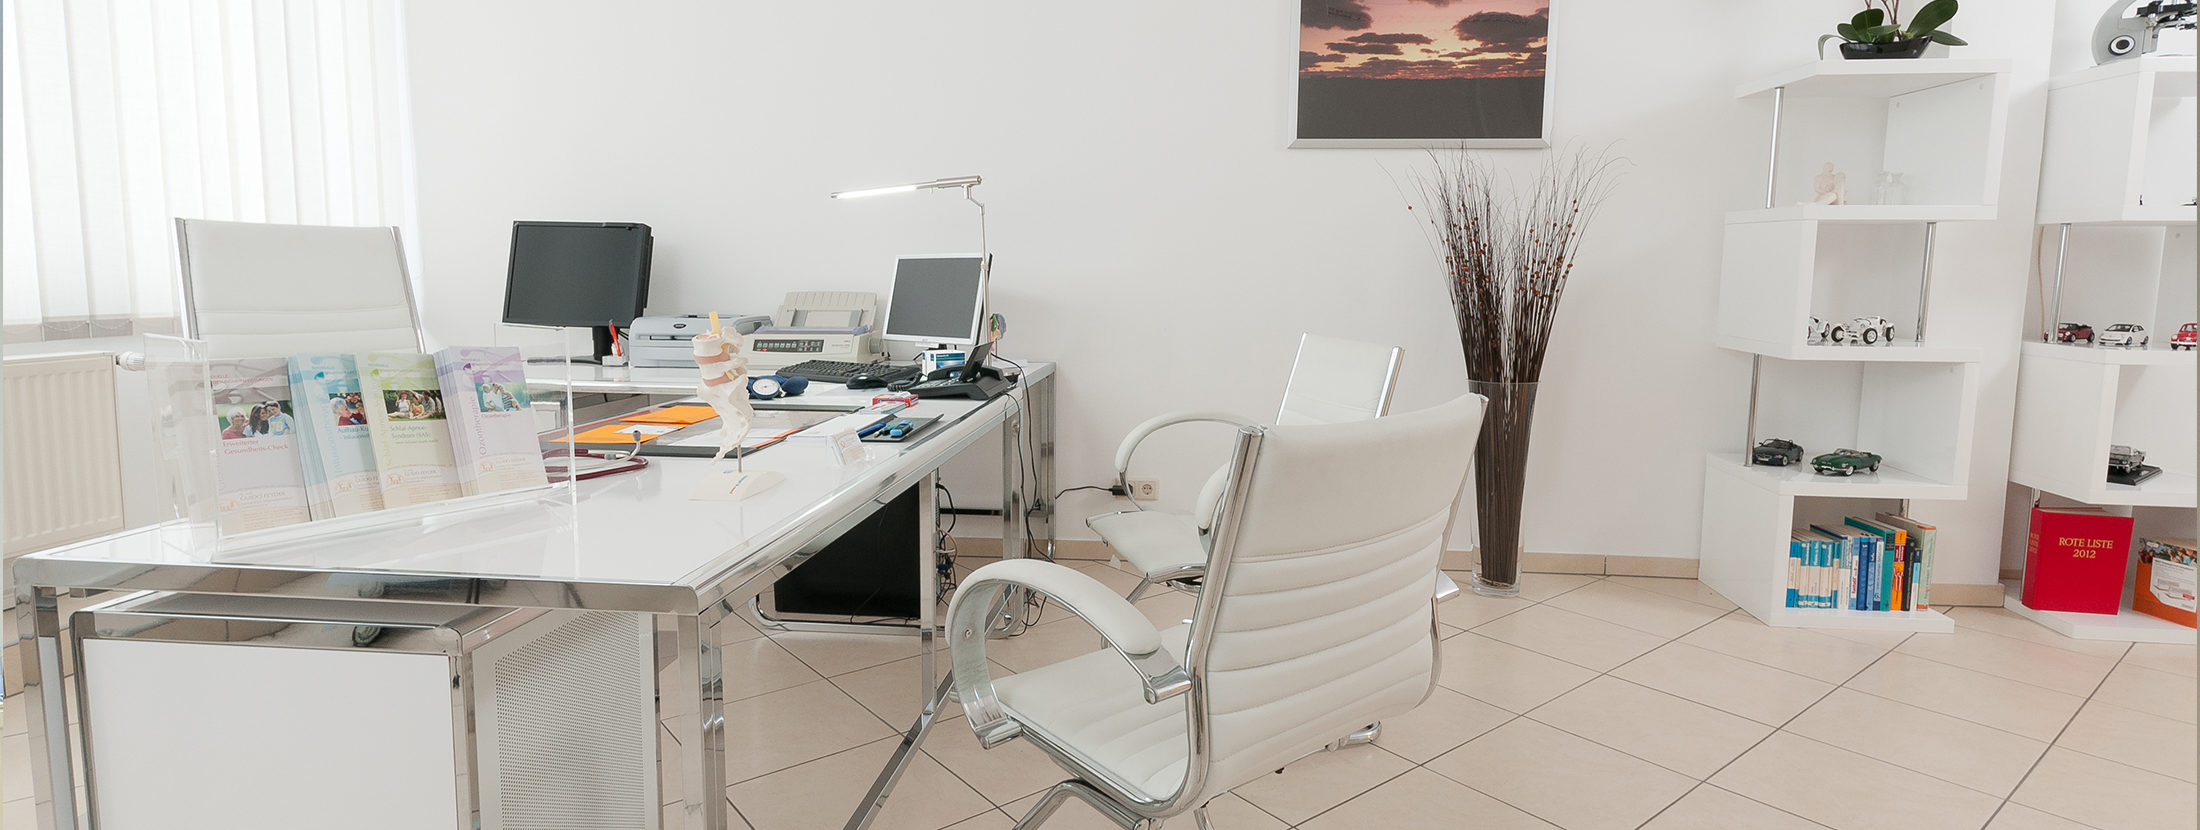 Das Beratungszimmer der Praxis